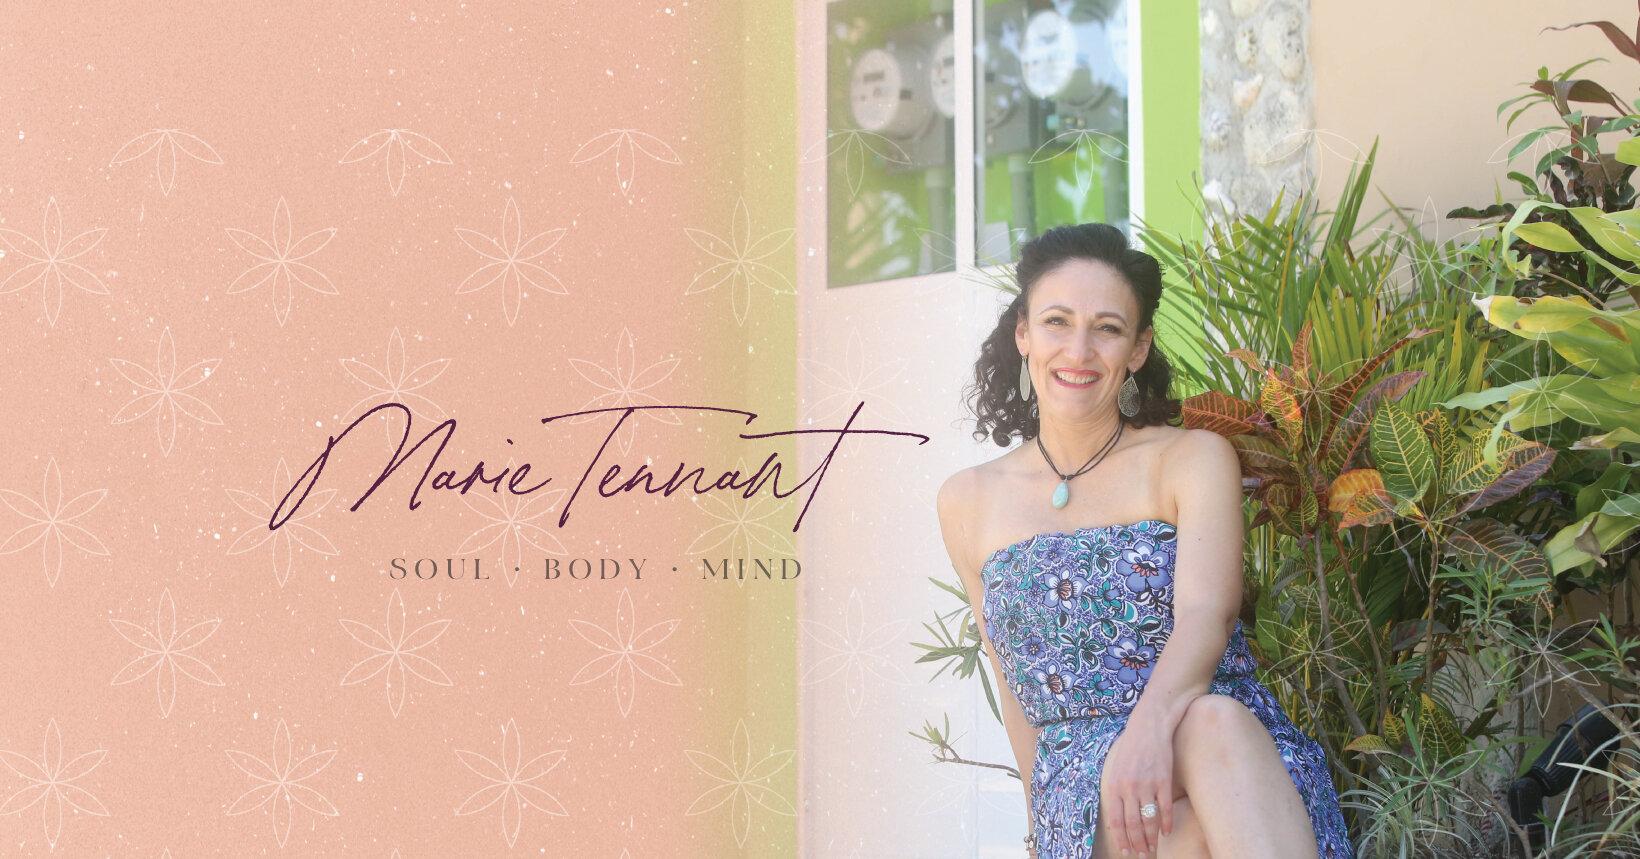 Marie Tennant - Soul - Body - Mind